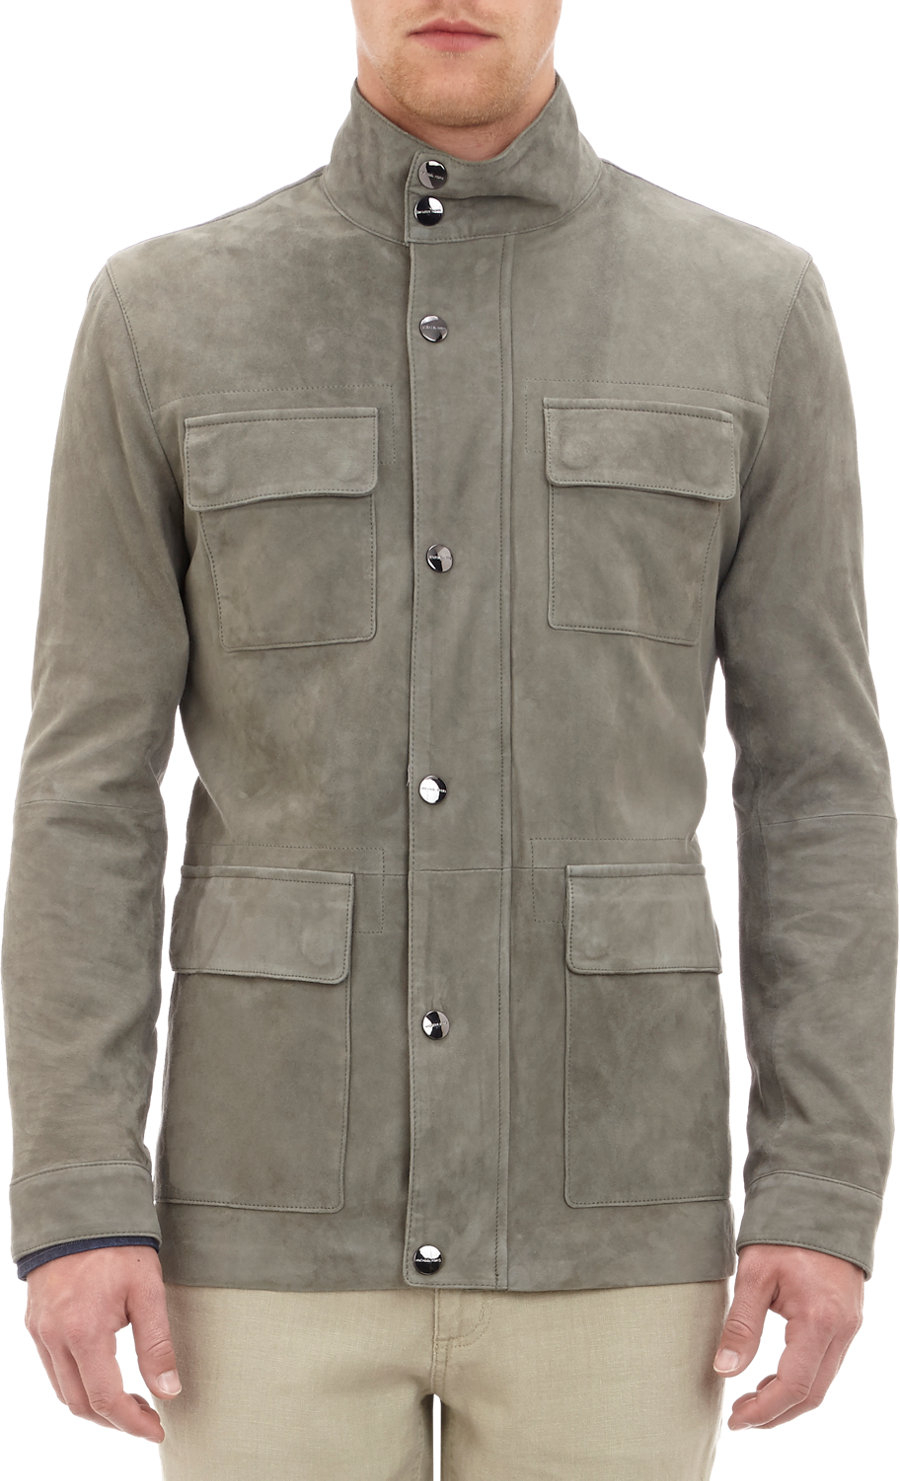 Michael Kors Suede Field Jacket In Gray For Men Grey Lyst